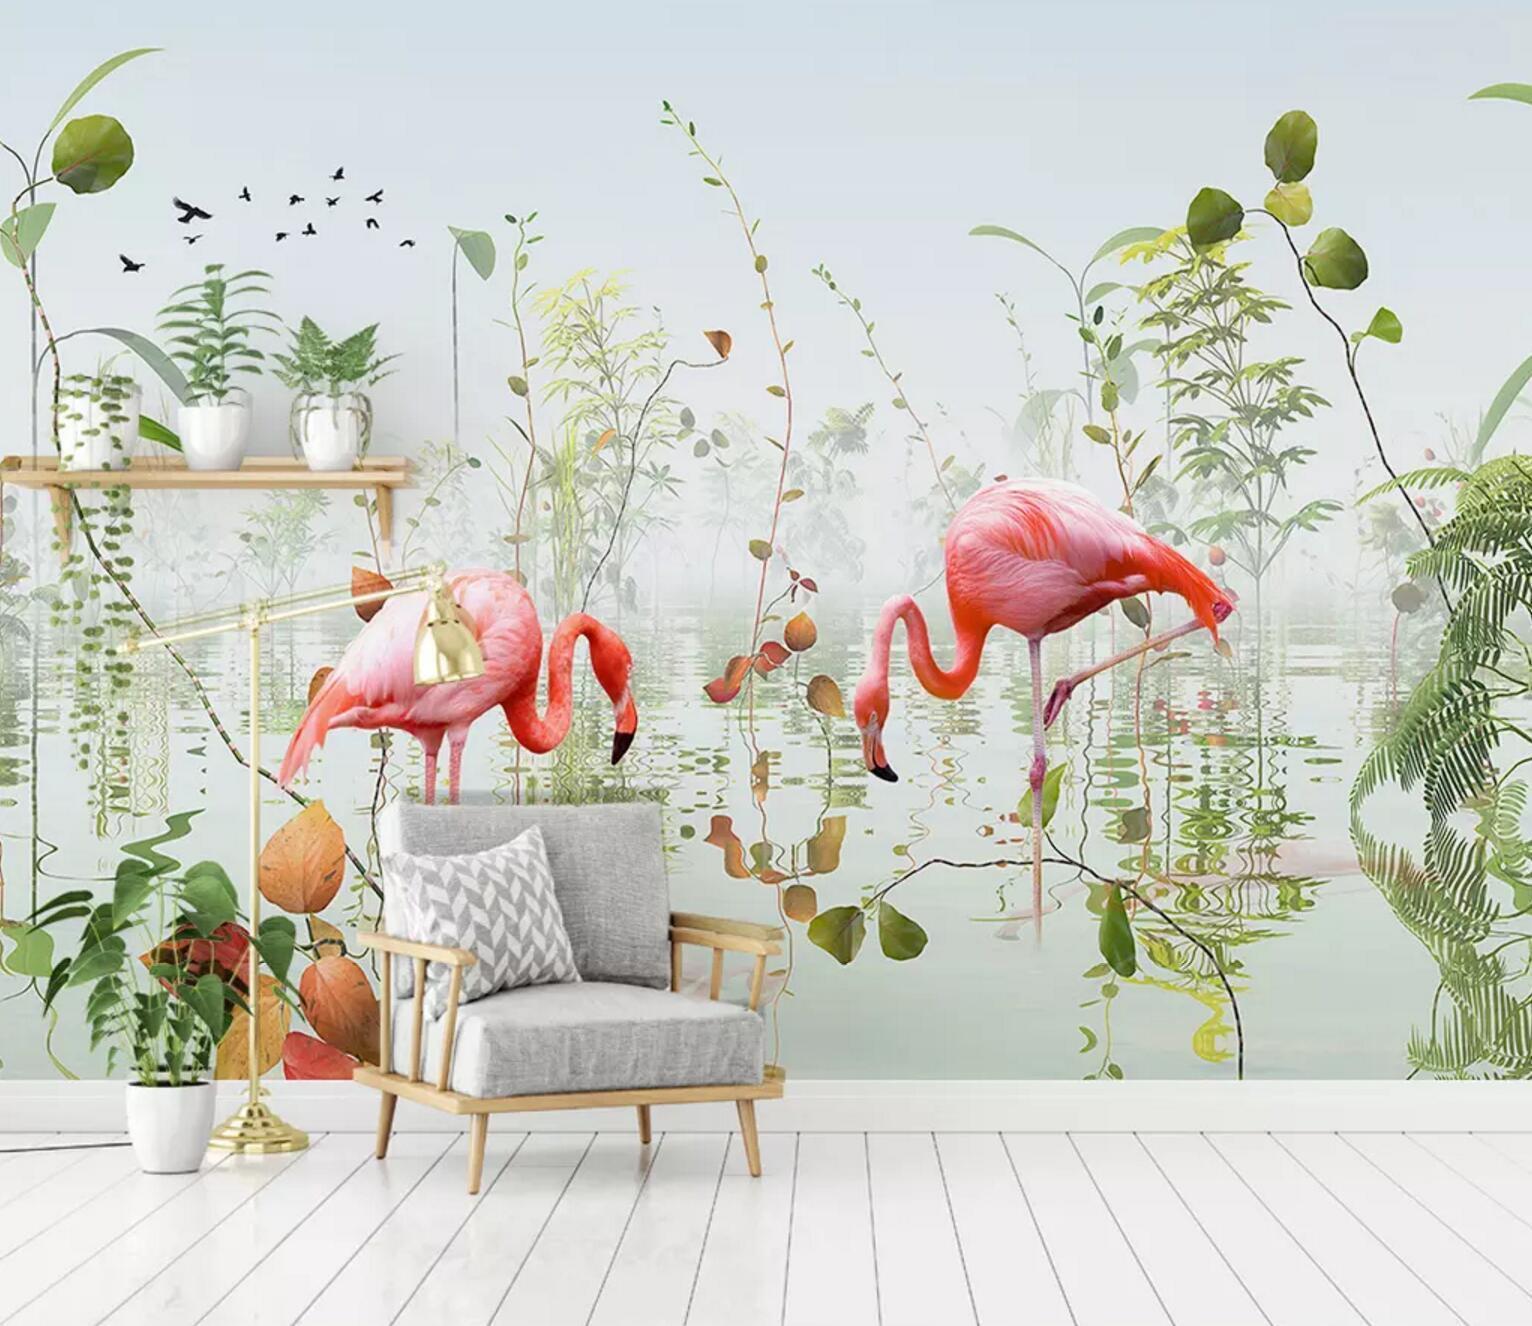 3D Flamingo Gras 964 Mauer Papier Exklusiv MXY Fototapete Abziehbild Innen Mauer